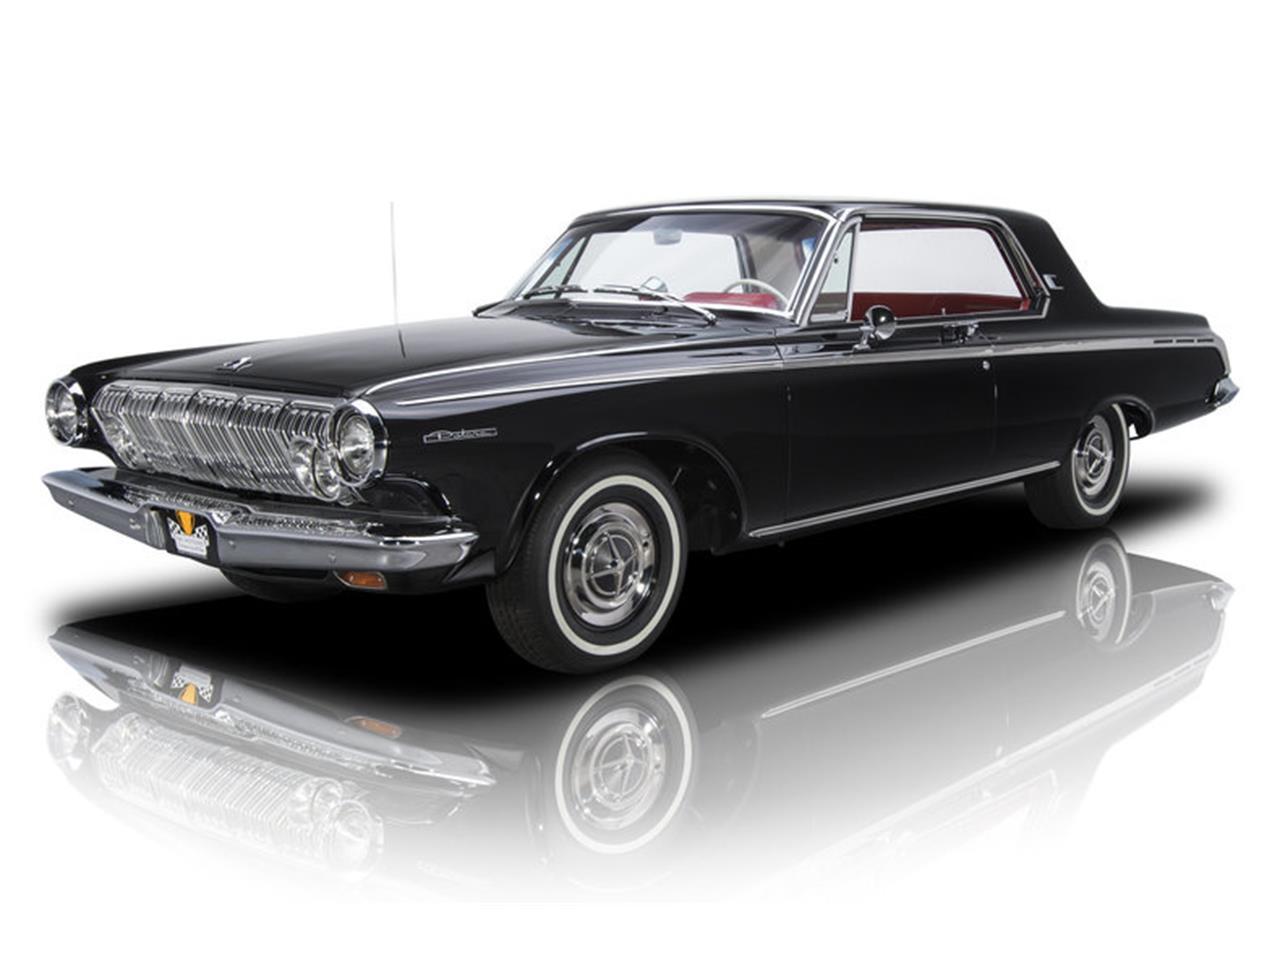 1964 Dodge Polara Wiring Diagram Simple 1963 For Sale Classiccars Com Cc 1042570 Dash